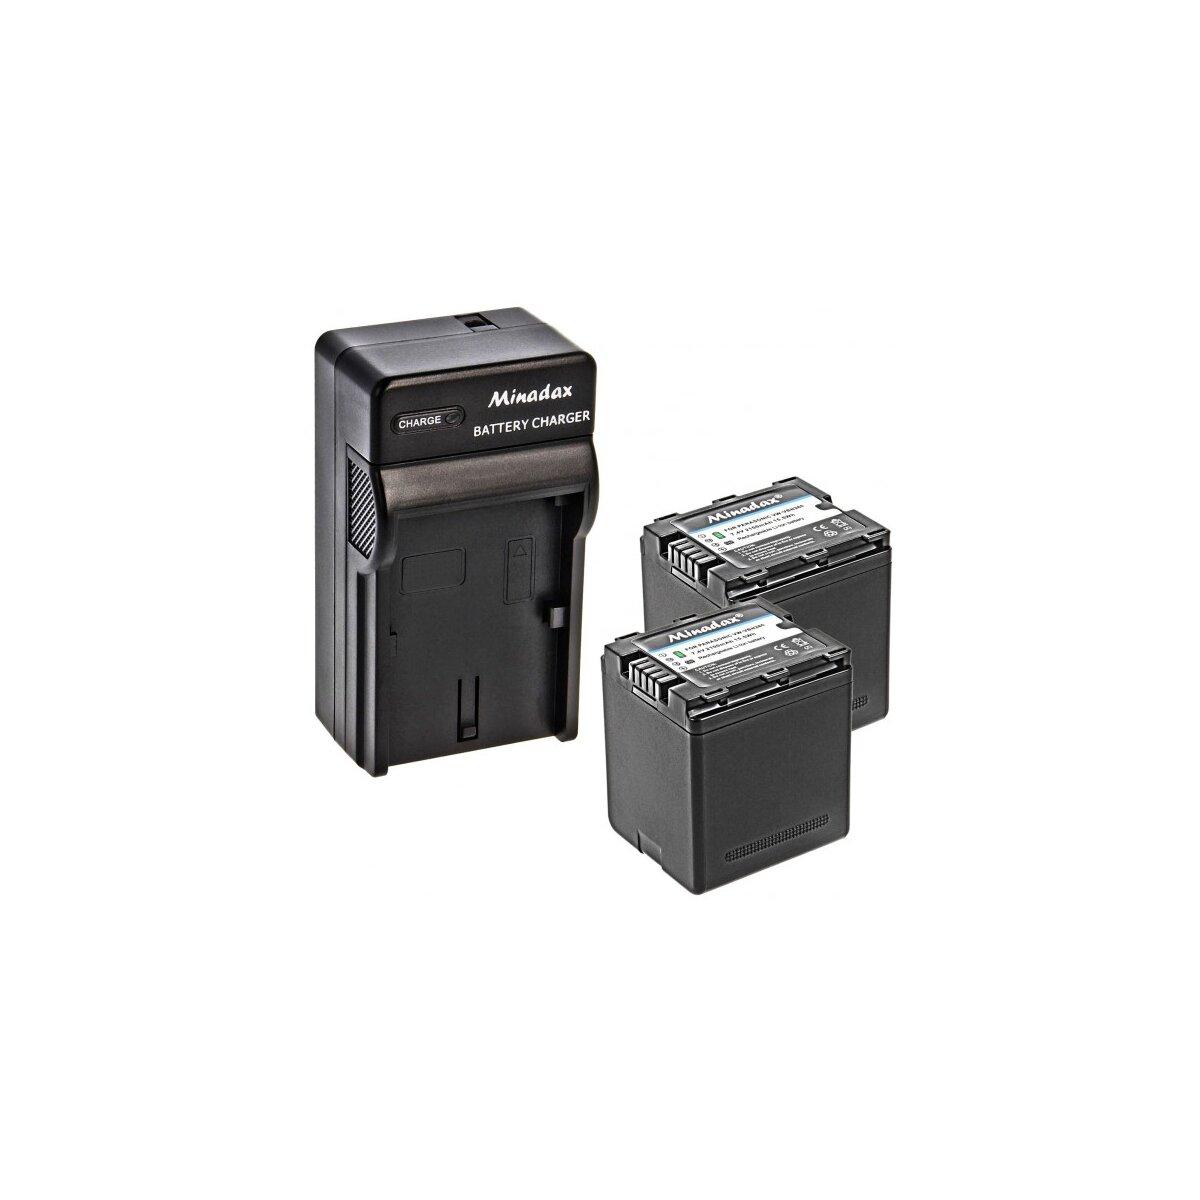 Minadax® Ladegerät 100% kompatibel mit Panasonic VW-VBN260 inkl. Auto Ladekabel, Ladeschale austauschbar + 2x Akku Ersatz für VW-VBN260